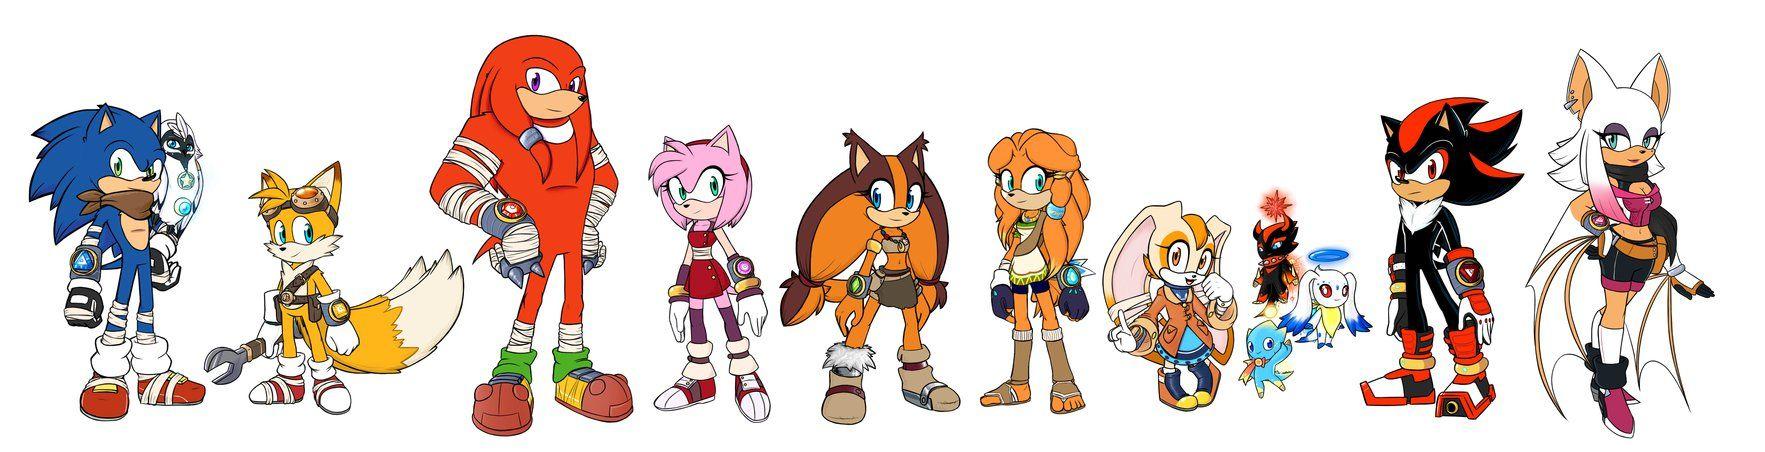 Team Sonic By Https Www Deviantart Com Spj Artredesign On Deviantart Sonic Sonic Fan Art Sonic Art